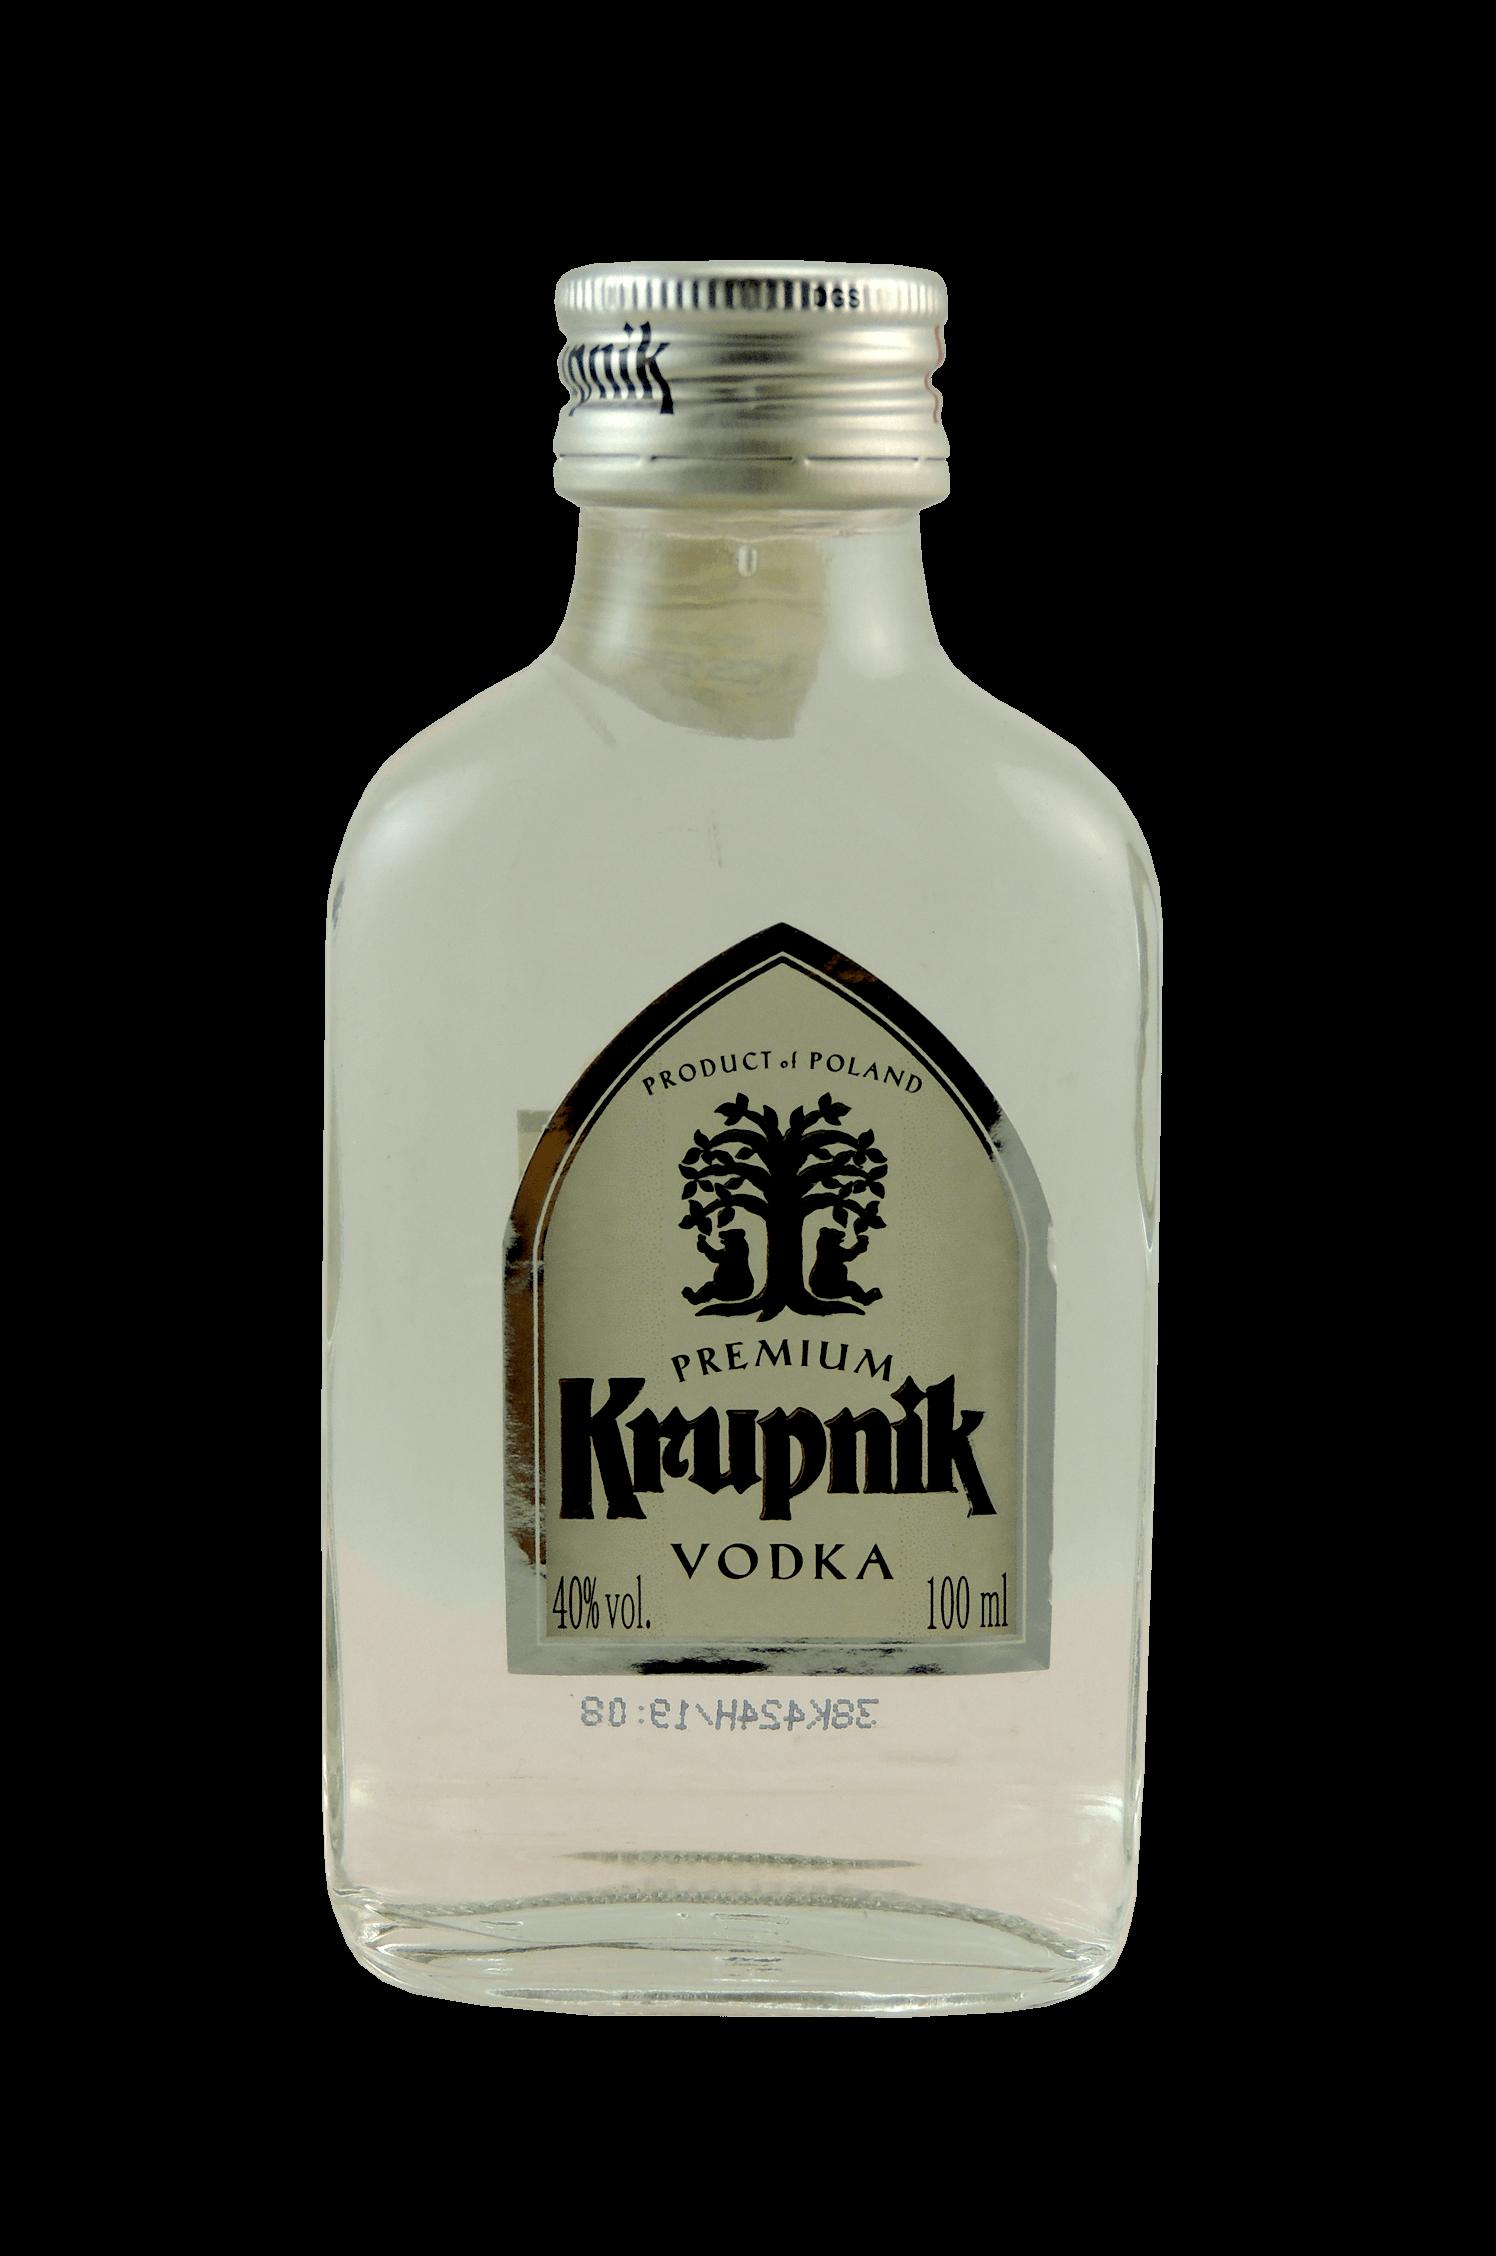 Premium Krupnik Vodka